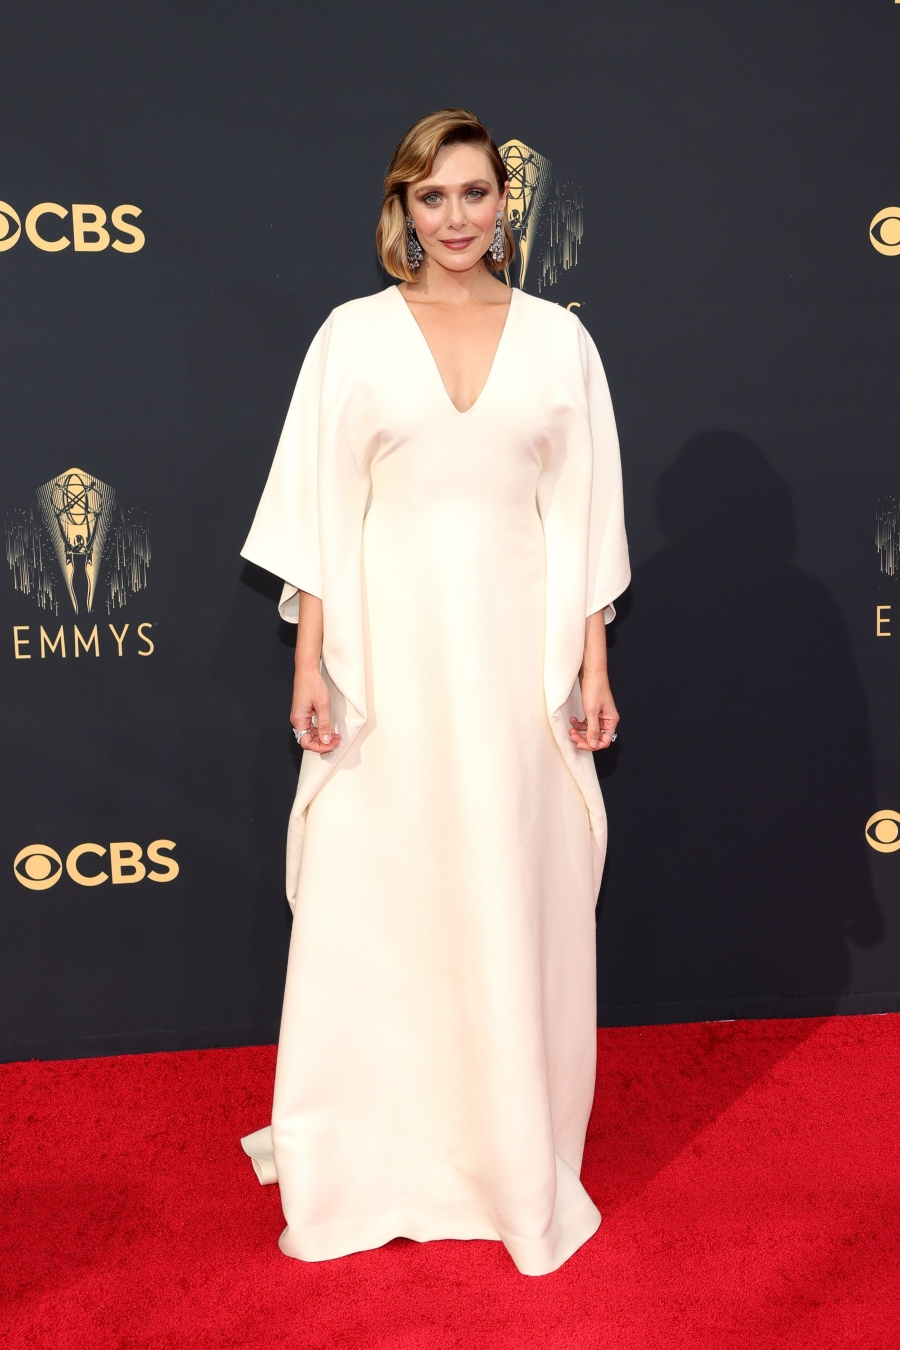 Elizabeth Olsen emmy awards